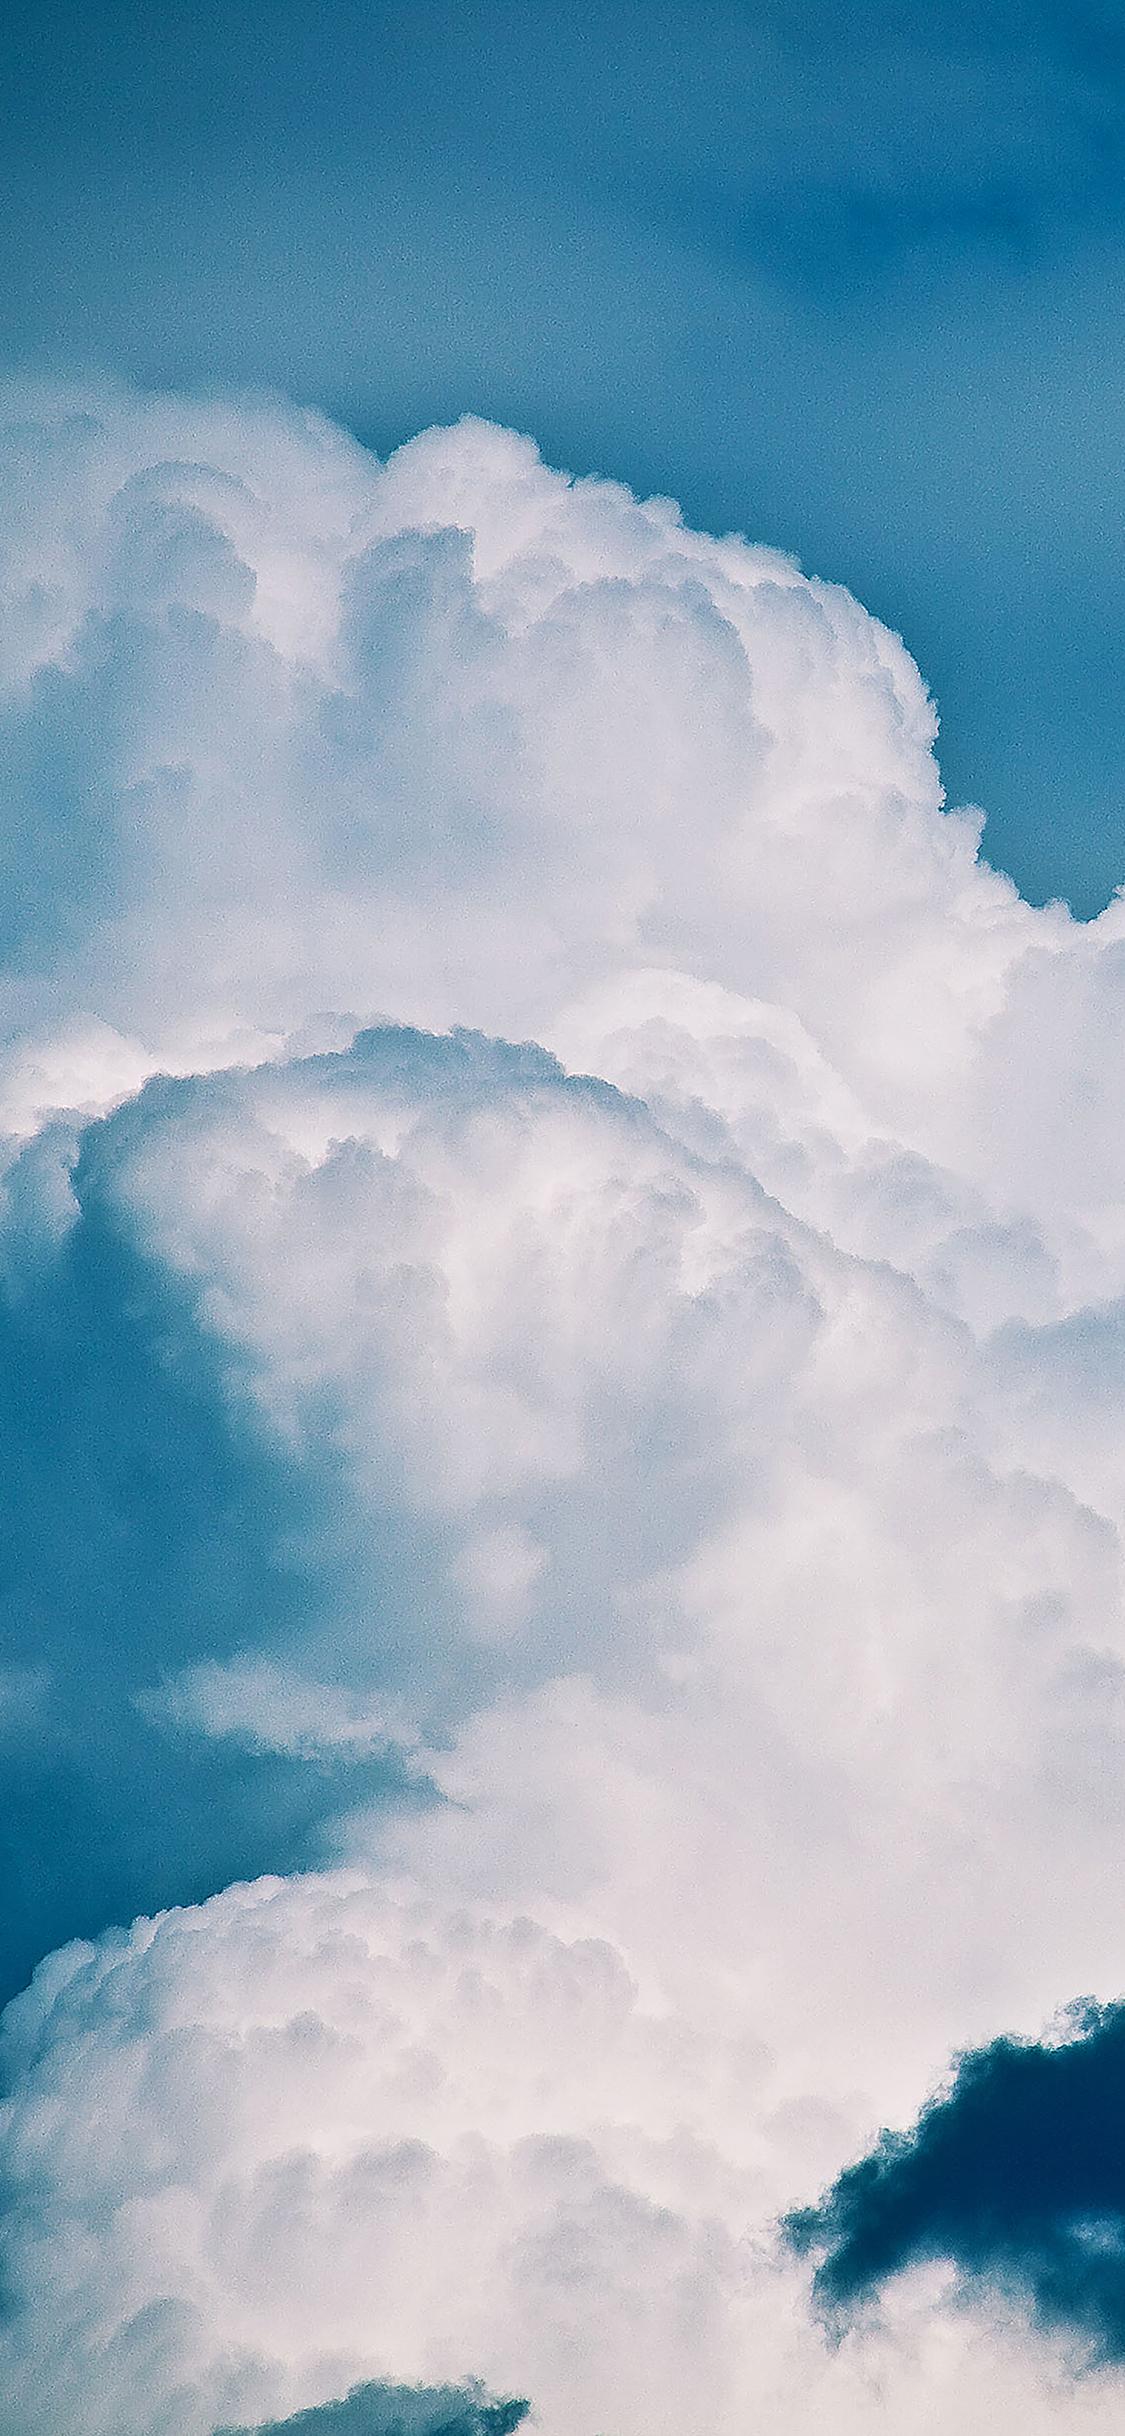 iPhoneXpapers.com-Apple-iPhone-wallpaper-mc90-wallpaper-cloud-above-6-sky-fly